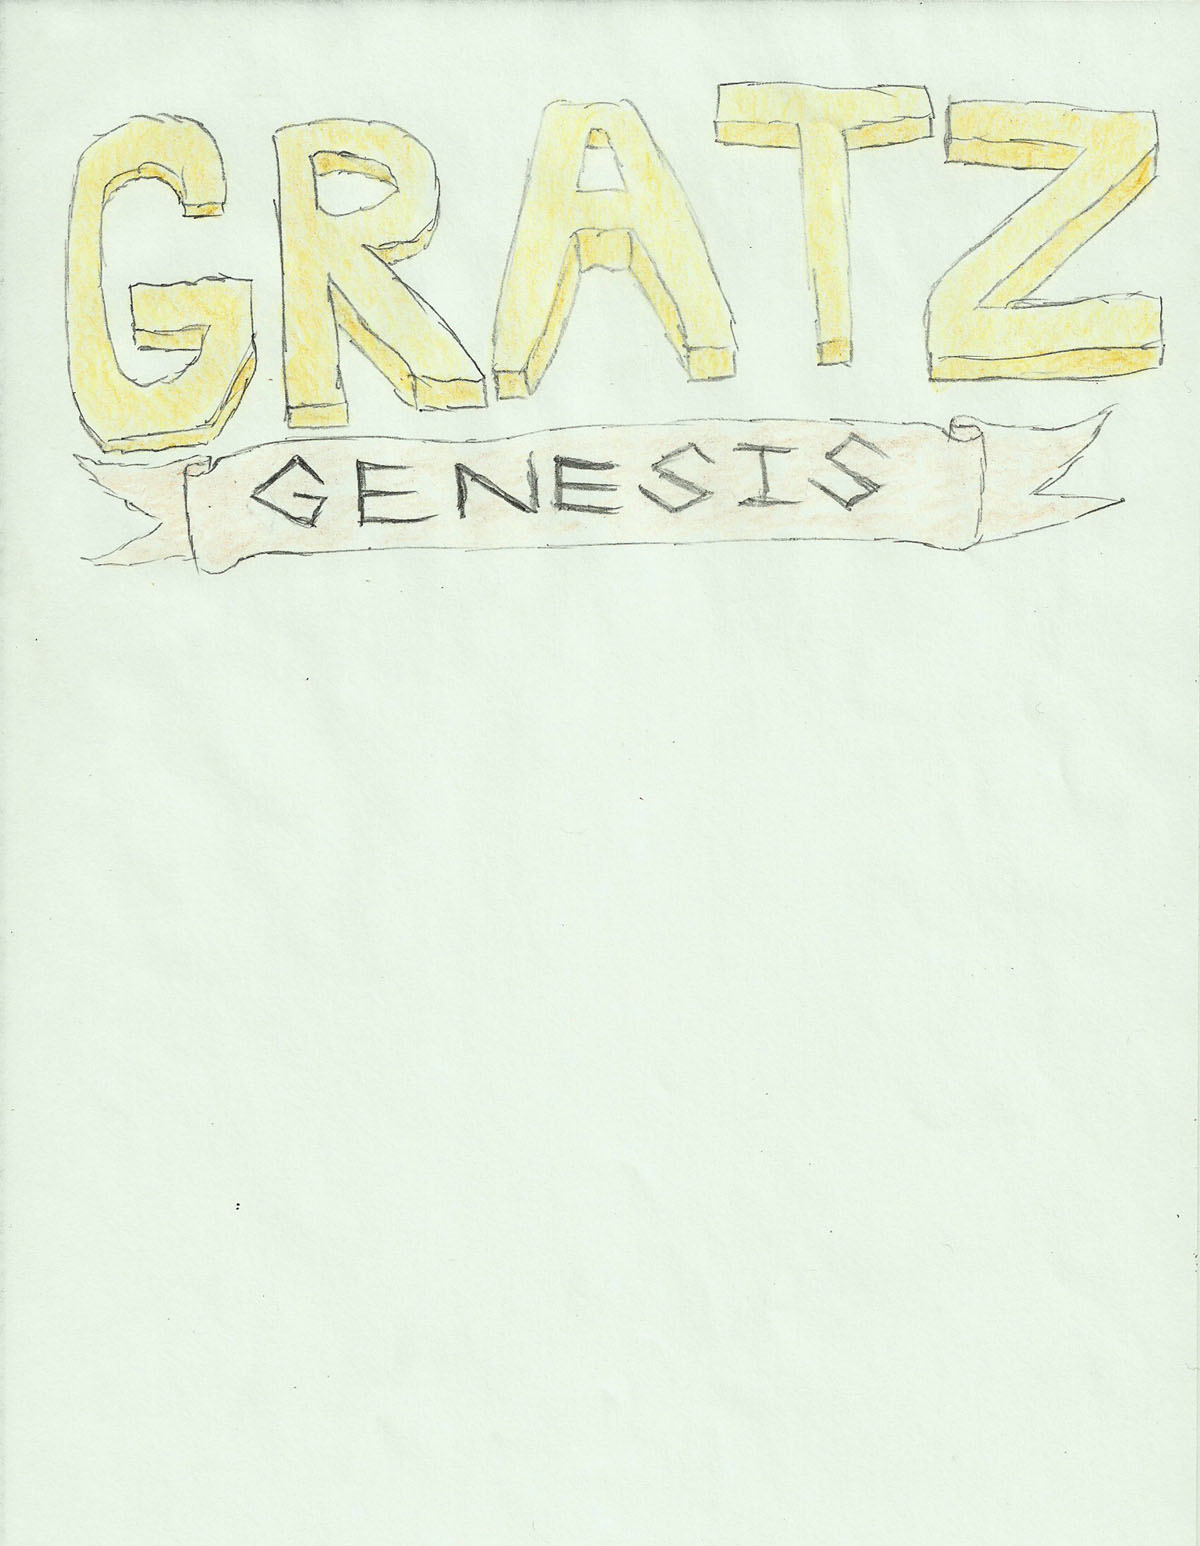 Gratz Genesis